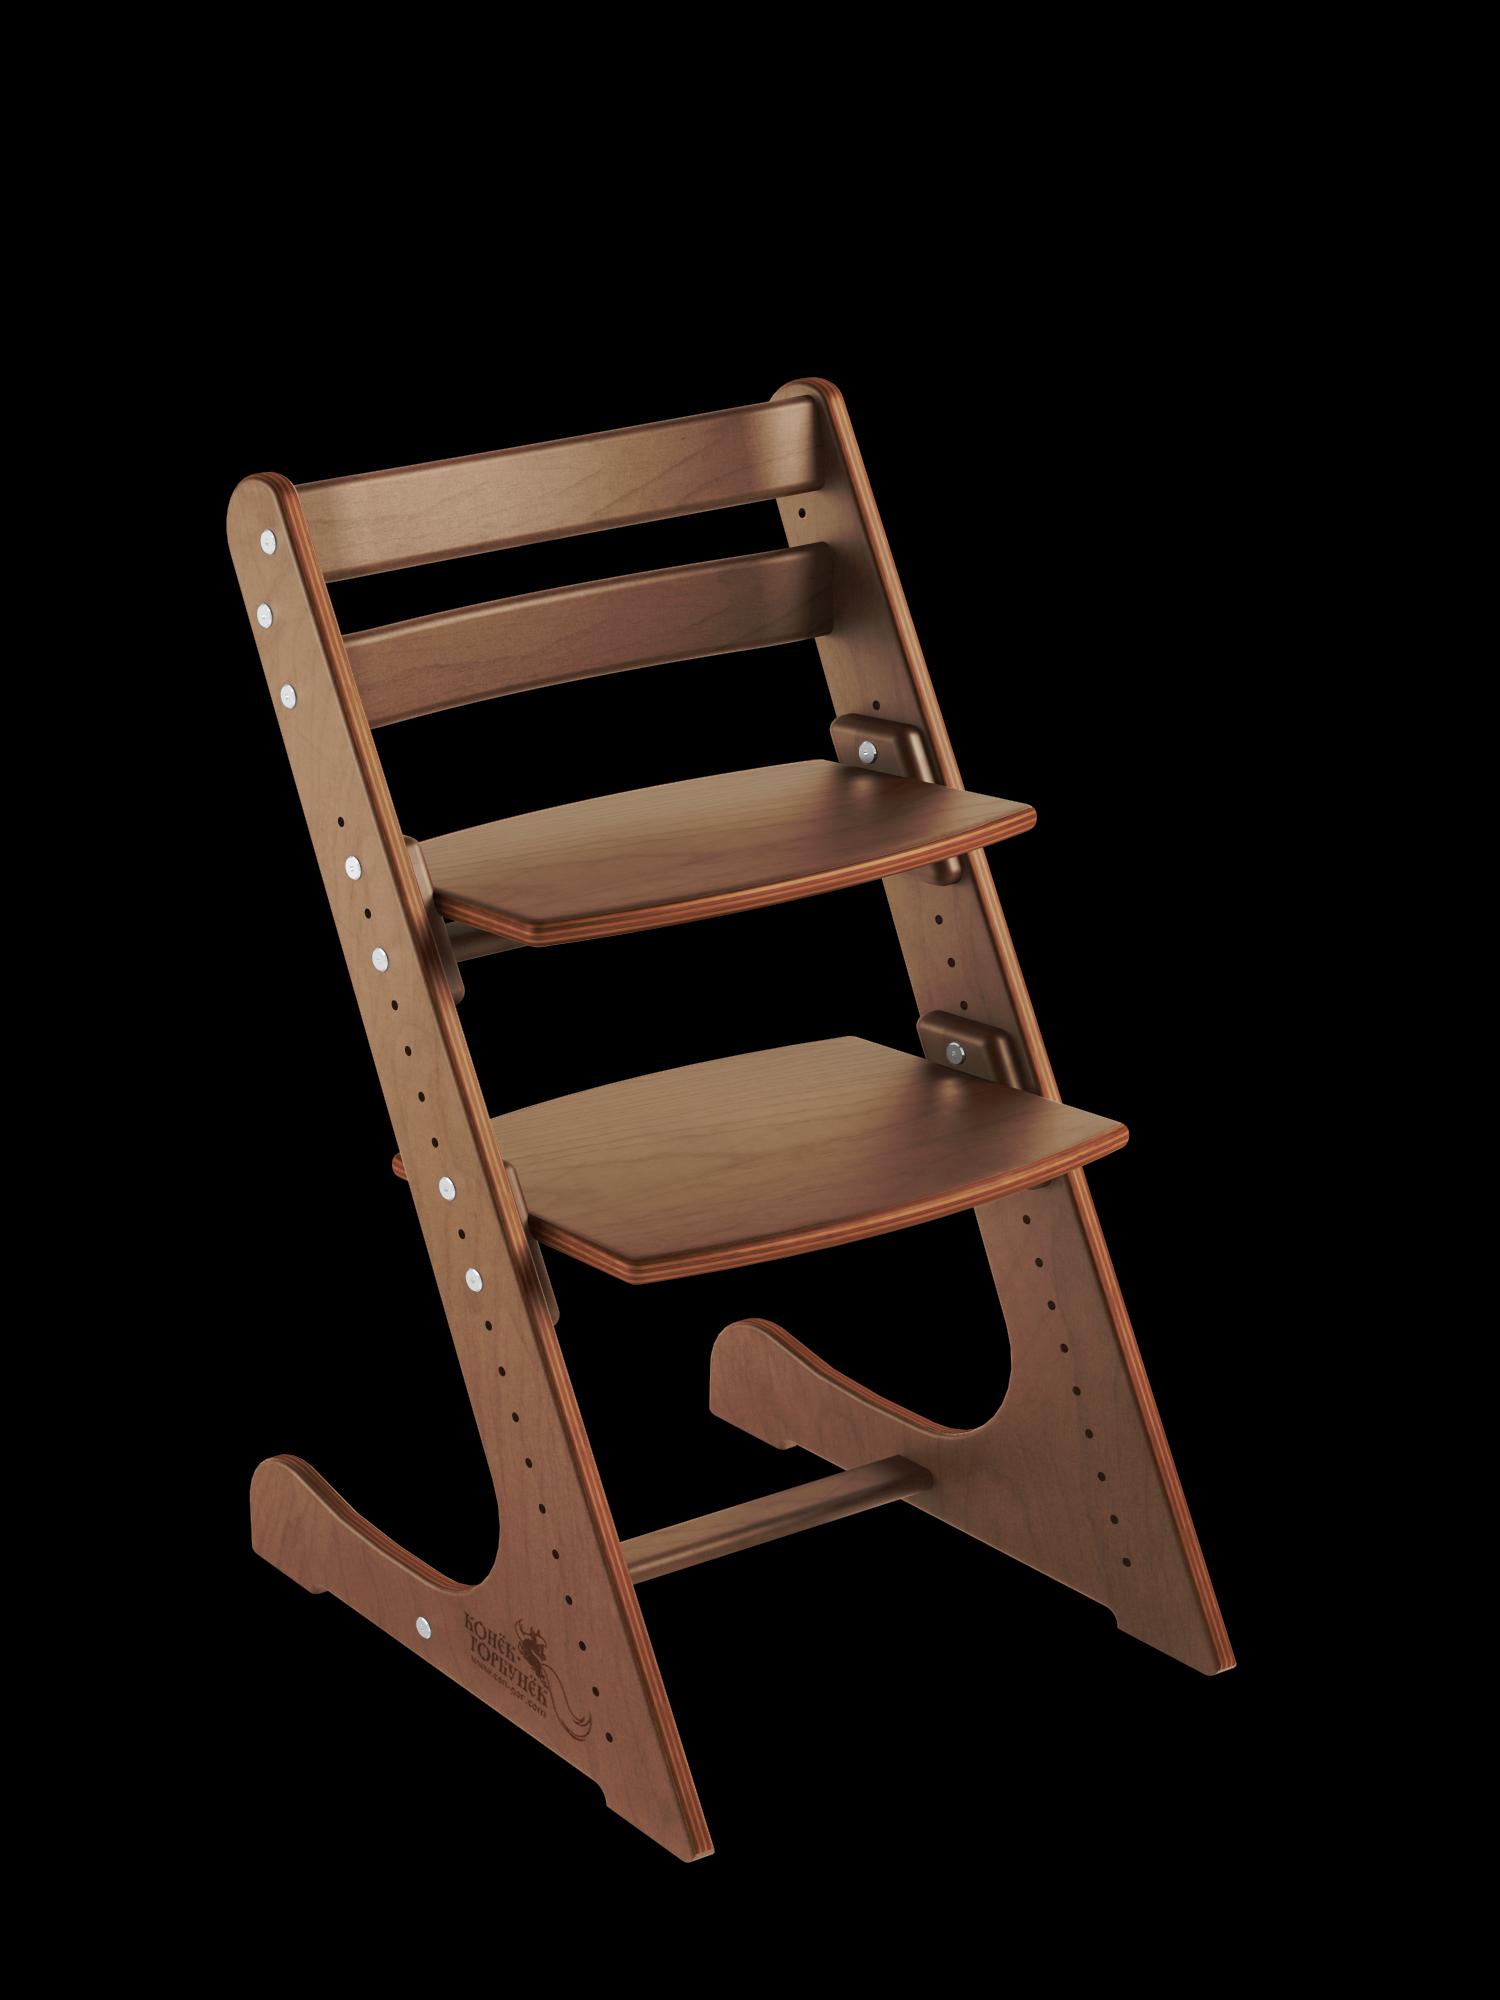 Детский растущий стул Конек Горбунек Комфорт Орех